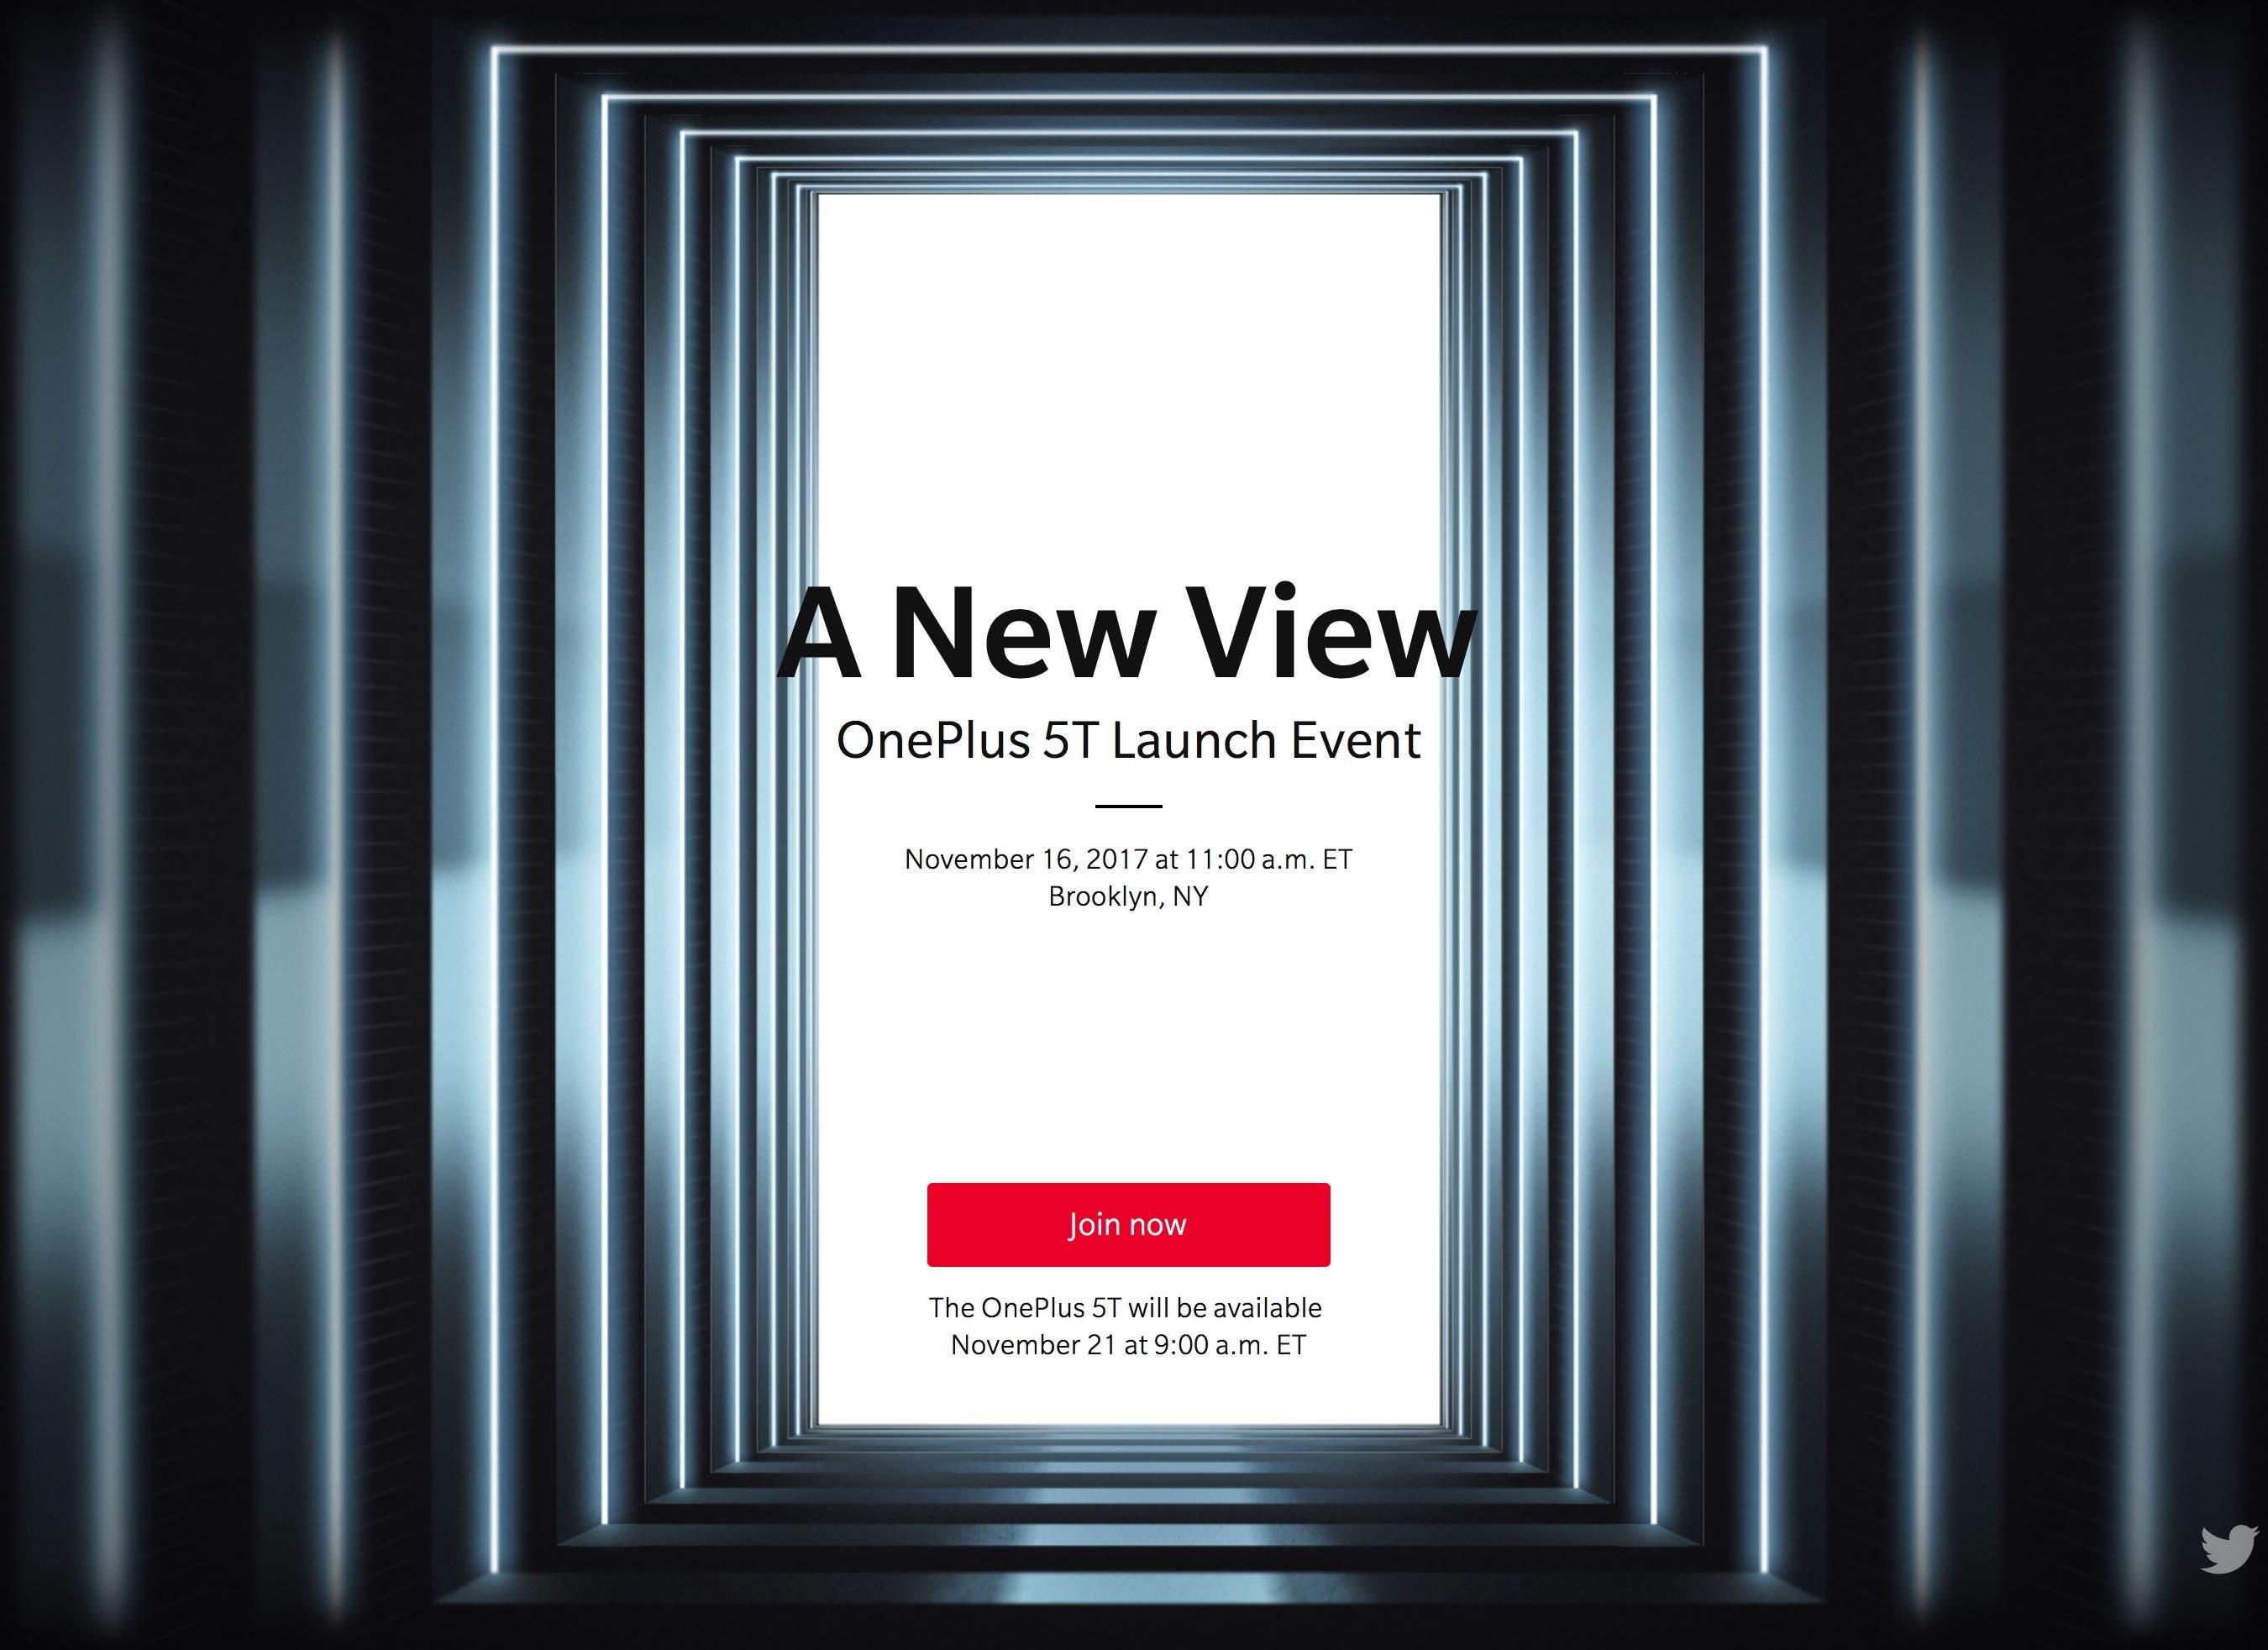 OnePlus 5T Teaser